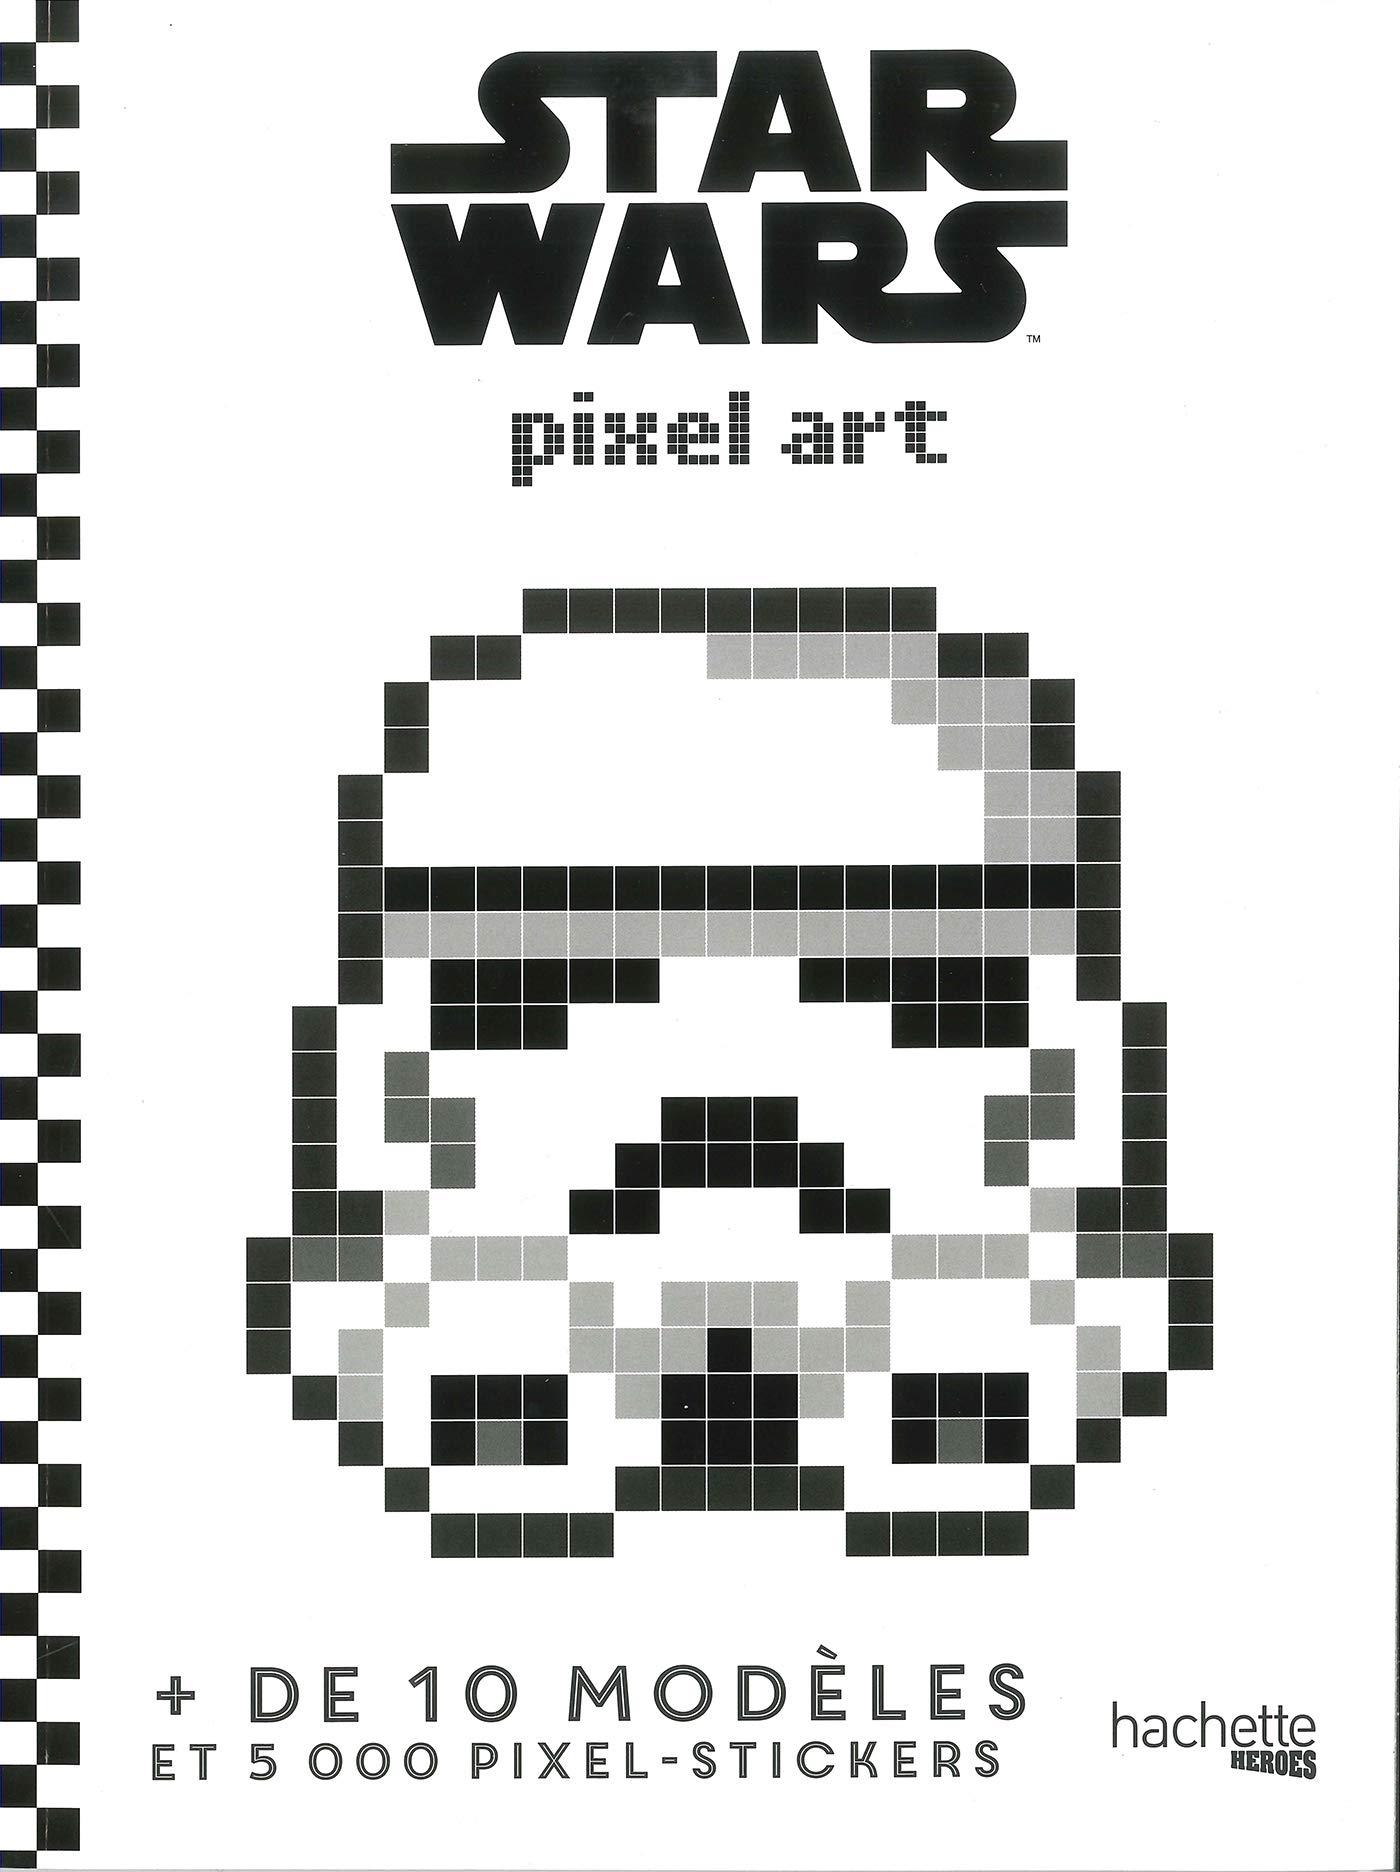 Star Wars Pixel Art Amazonfr Jérémy Mariez Livres